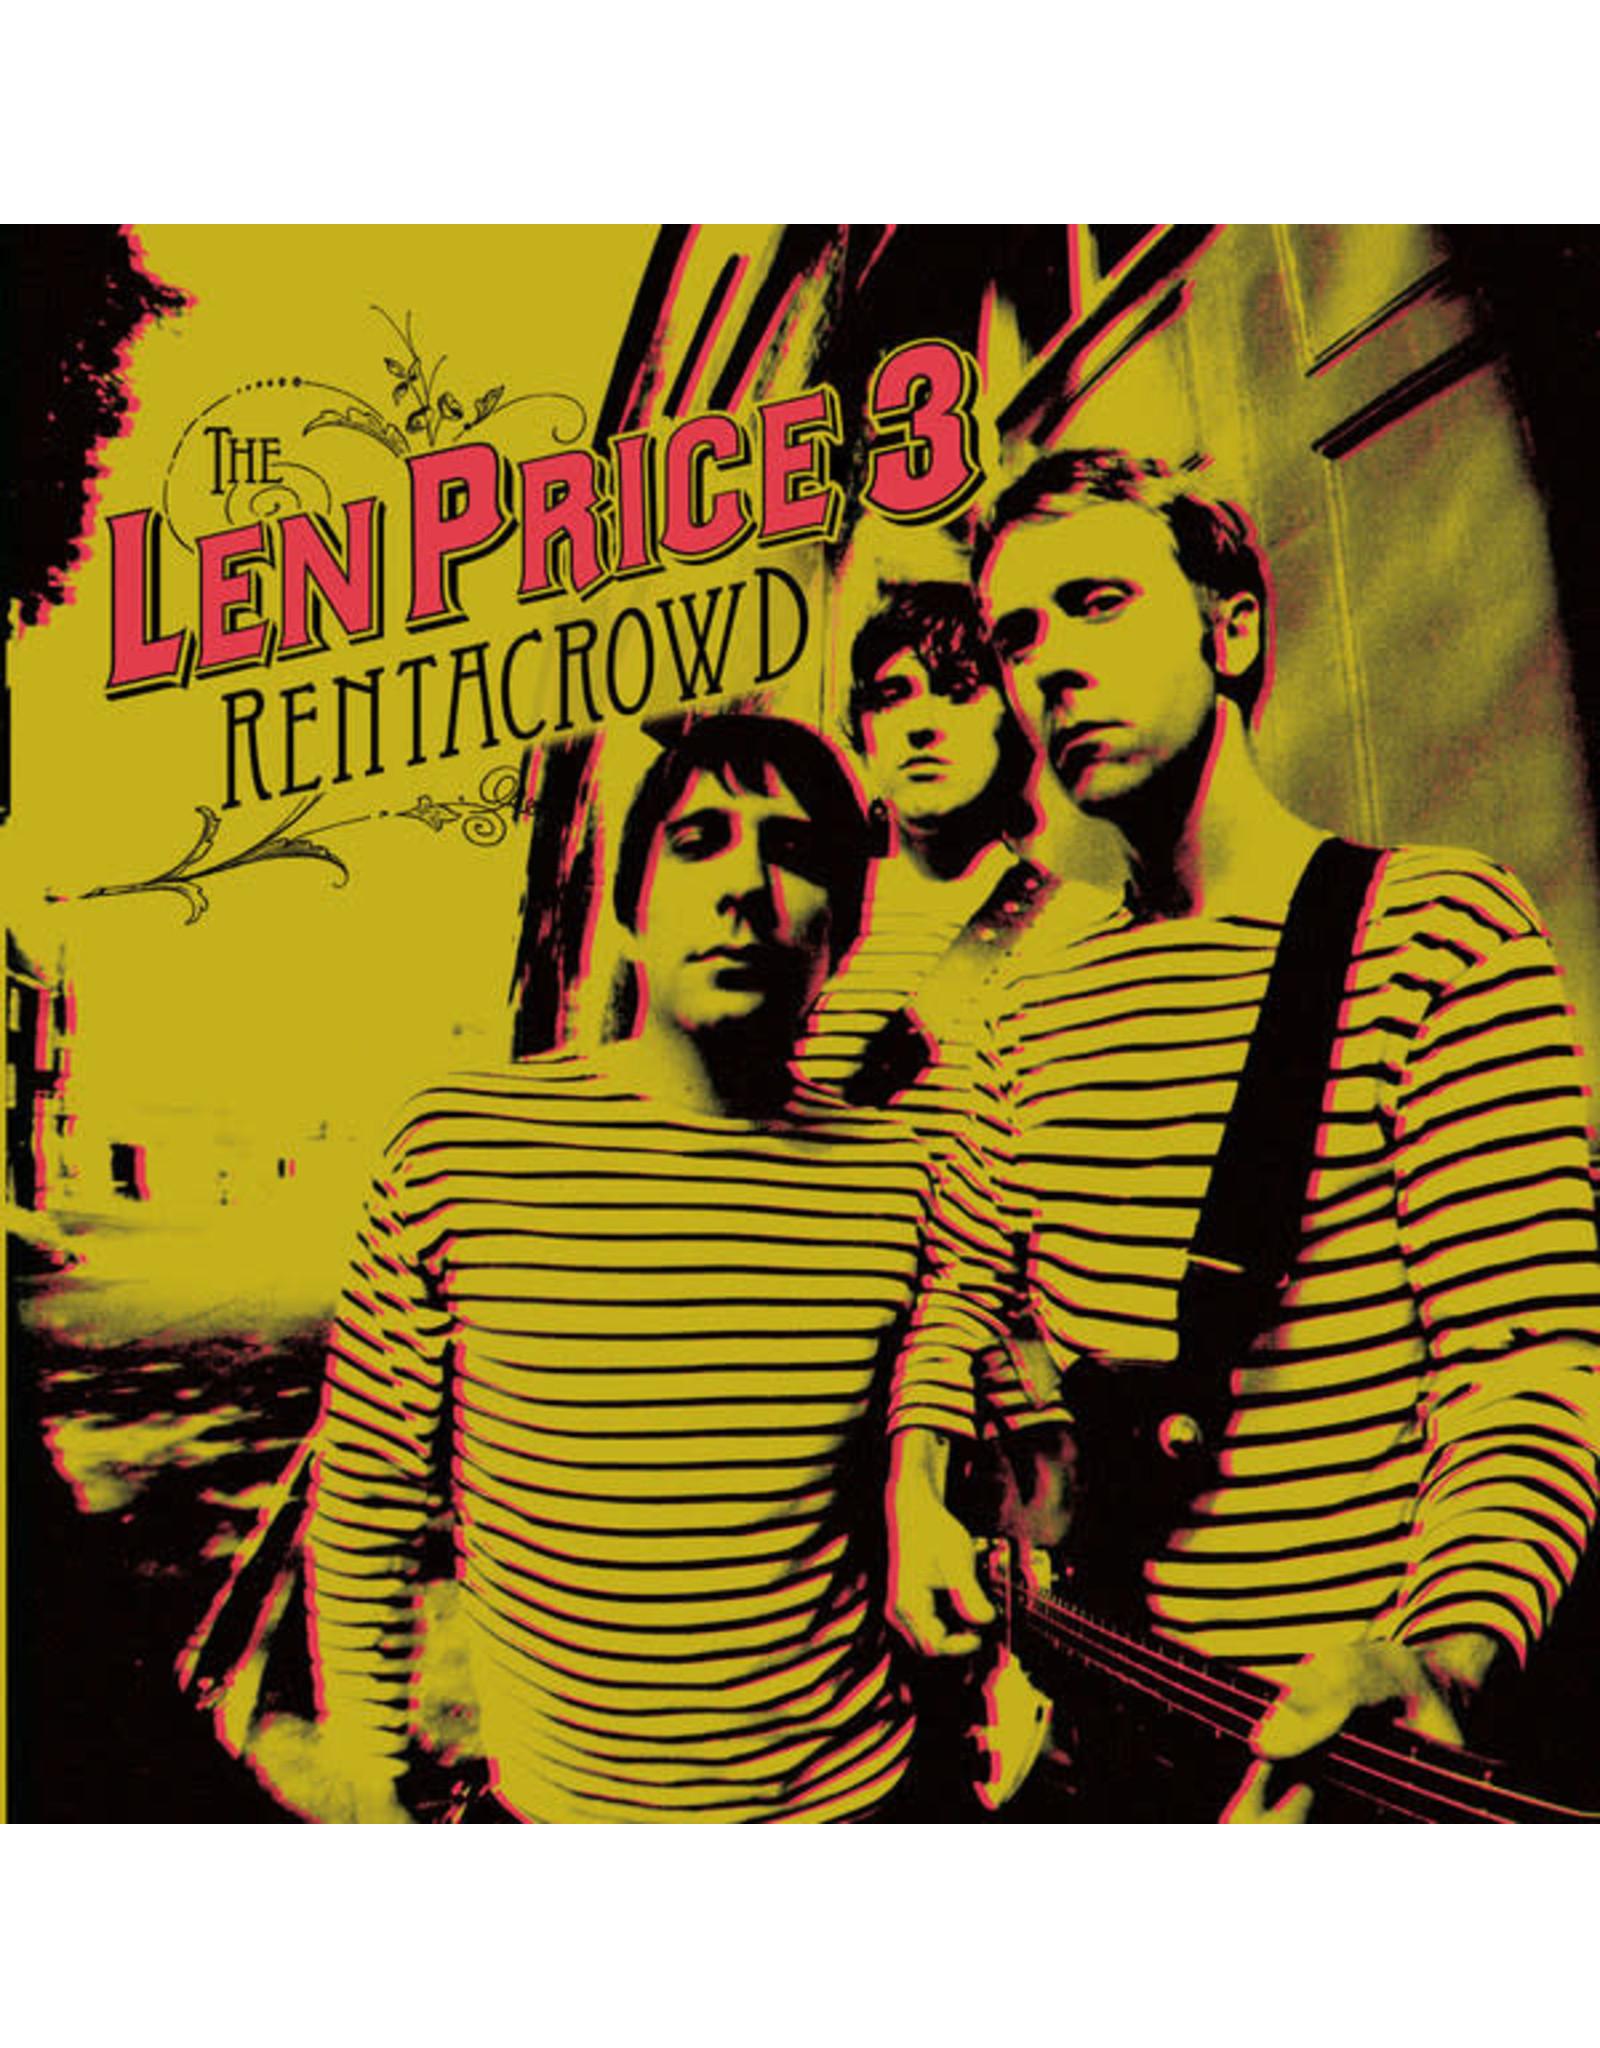 Vinyl The Len Price 3 - Rentacrowd  Final Sale